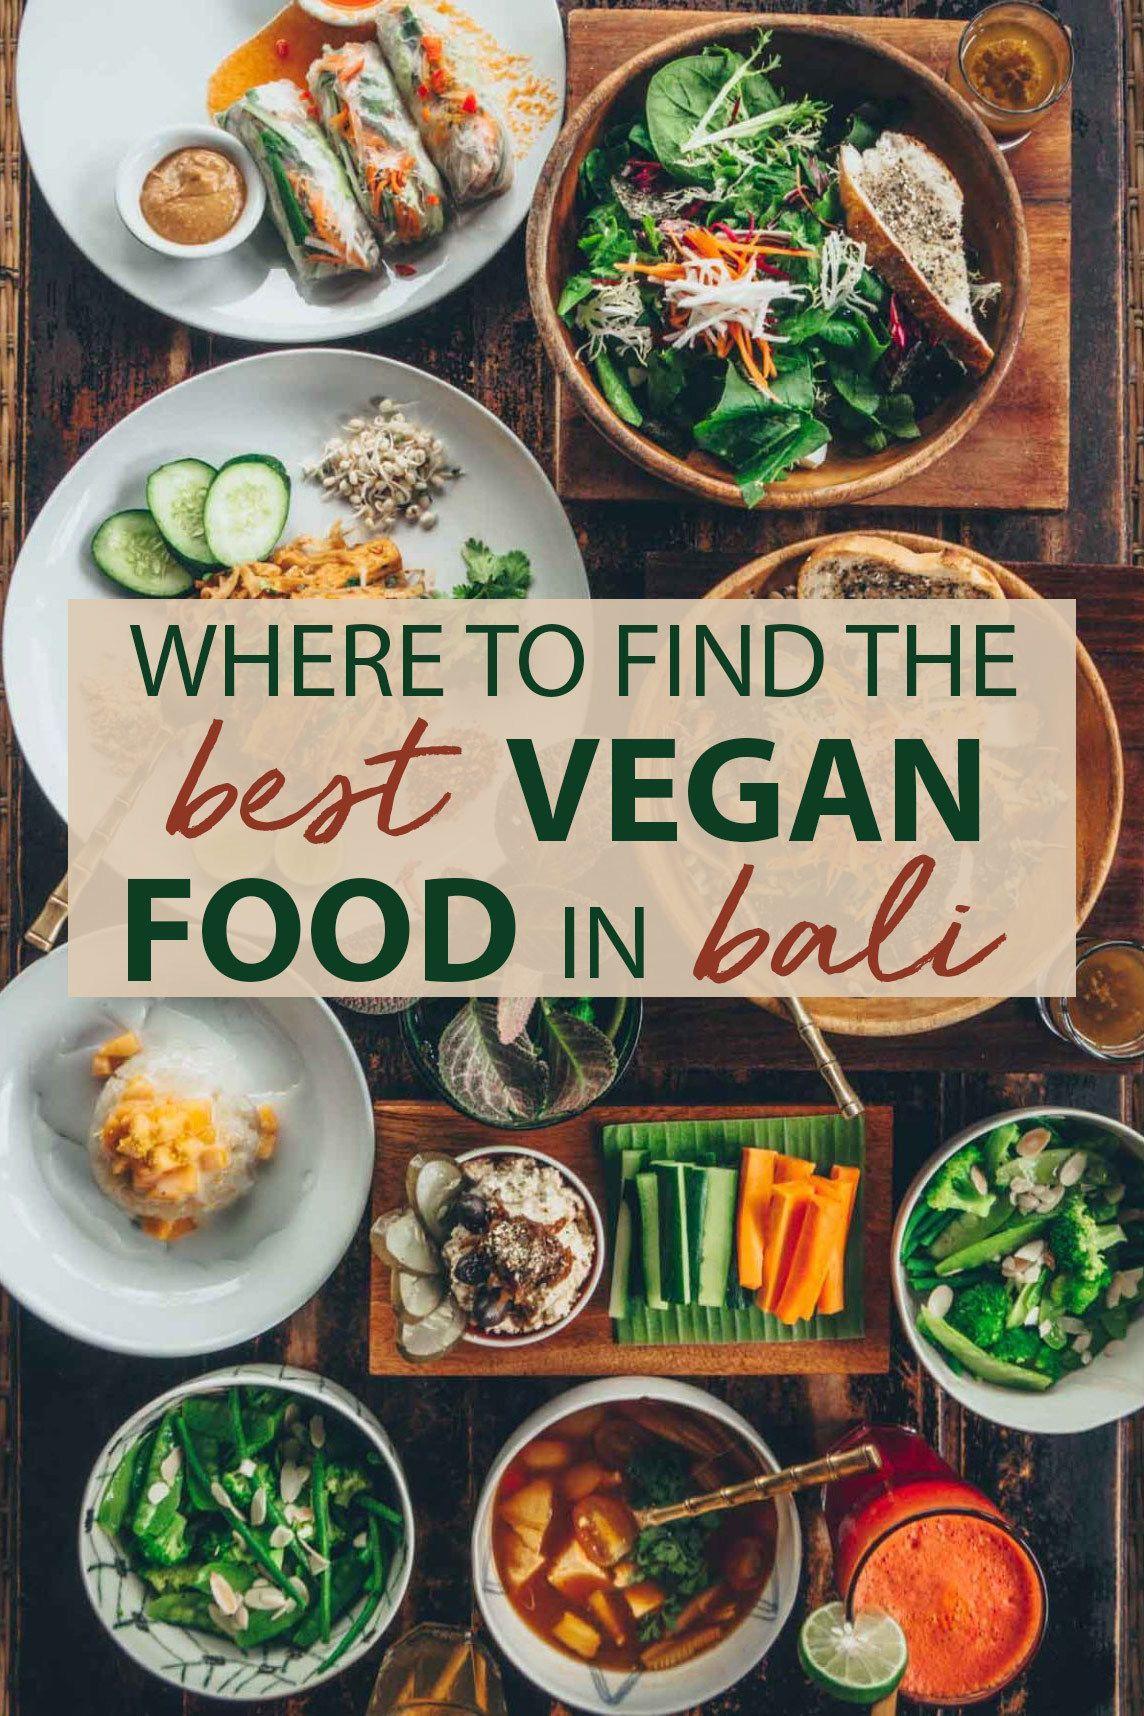 Where To Find The Best Vegan Food In Bali The Blonde Abroad Vegan Restaurants Vegetarian Travel International Recipes